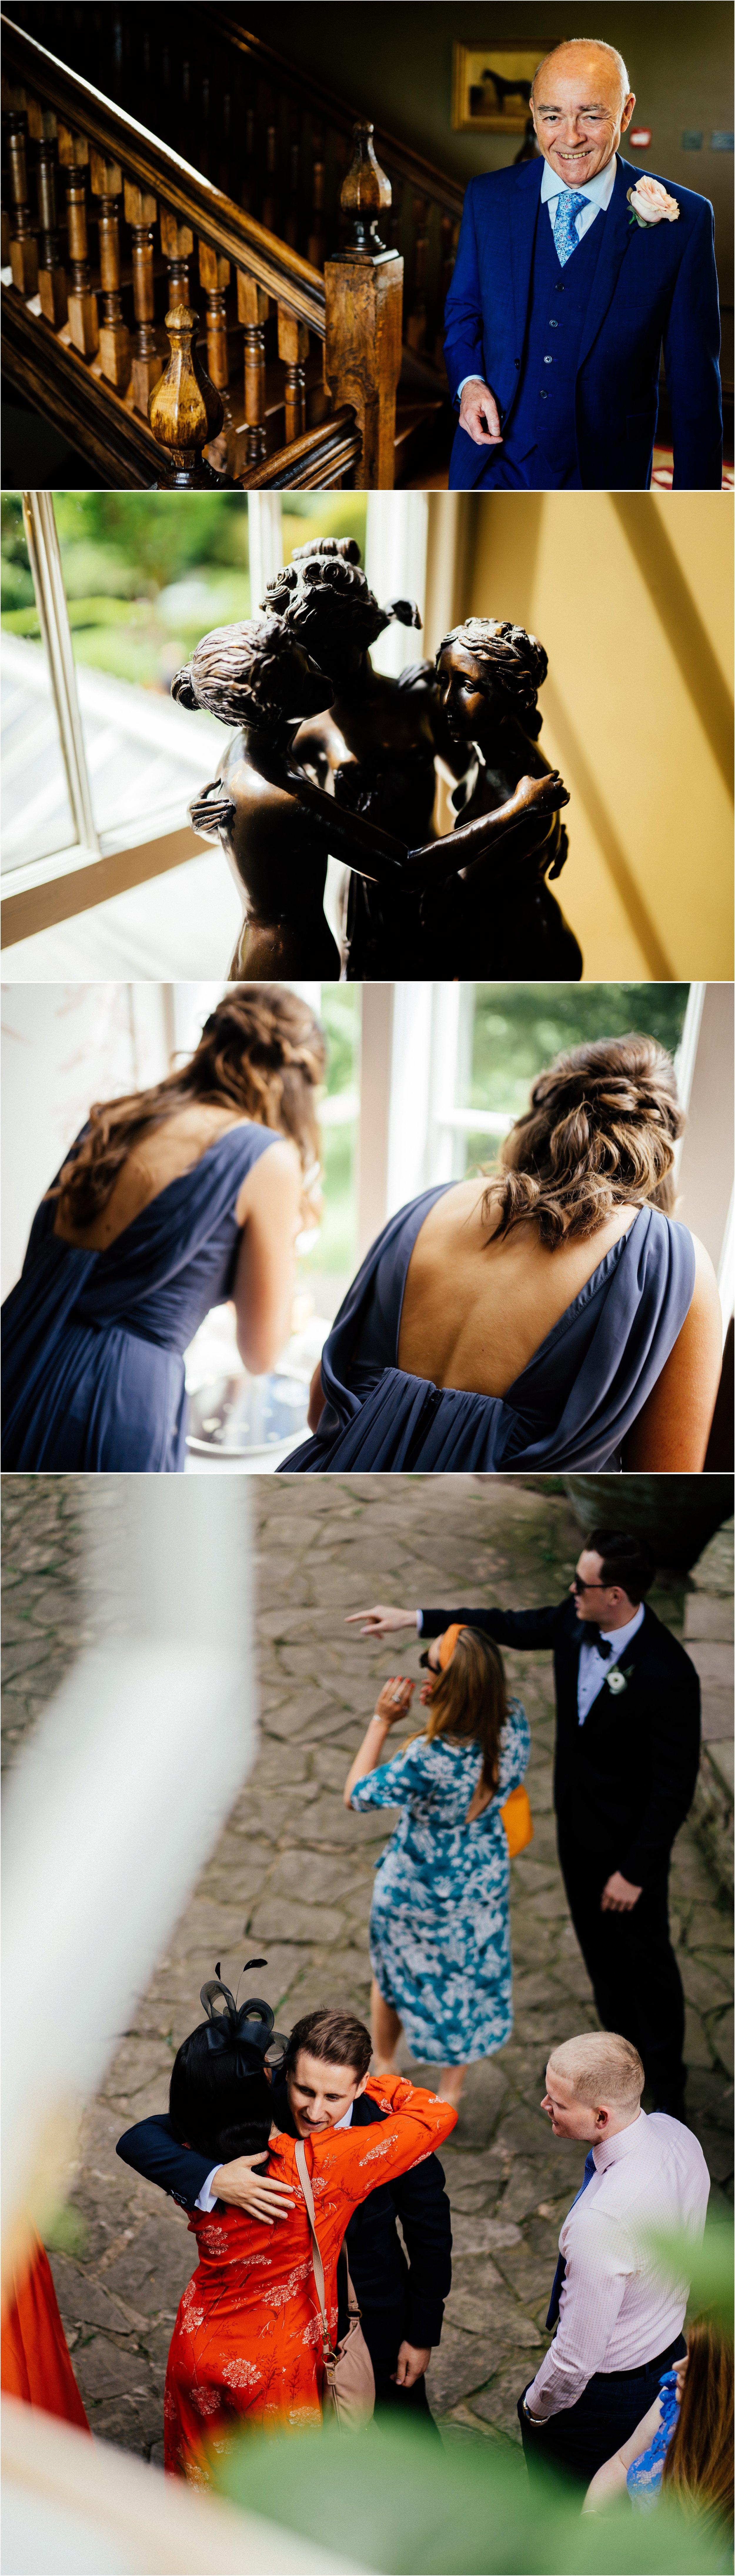 Dewsall Court Herefordshire wedding photographer_0018.jpg